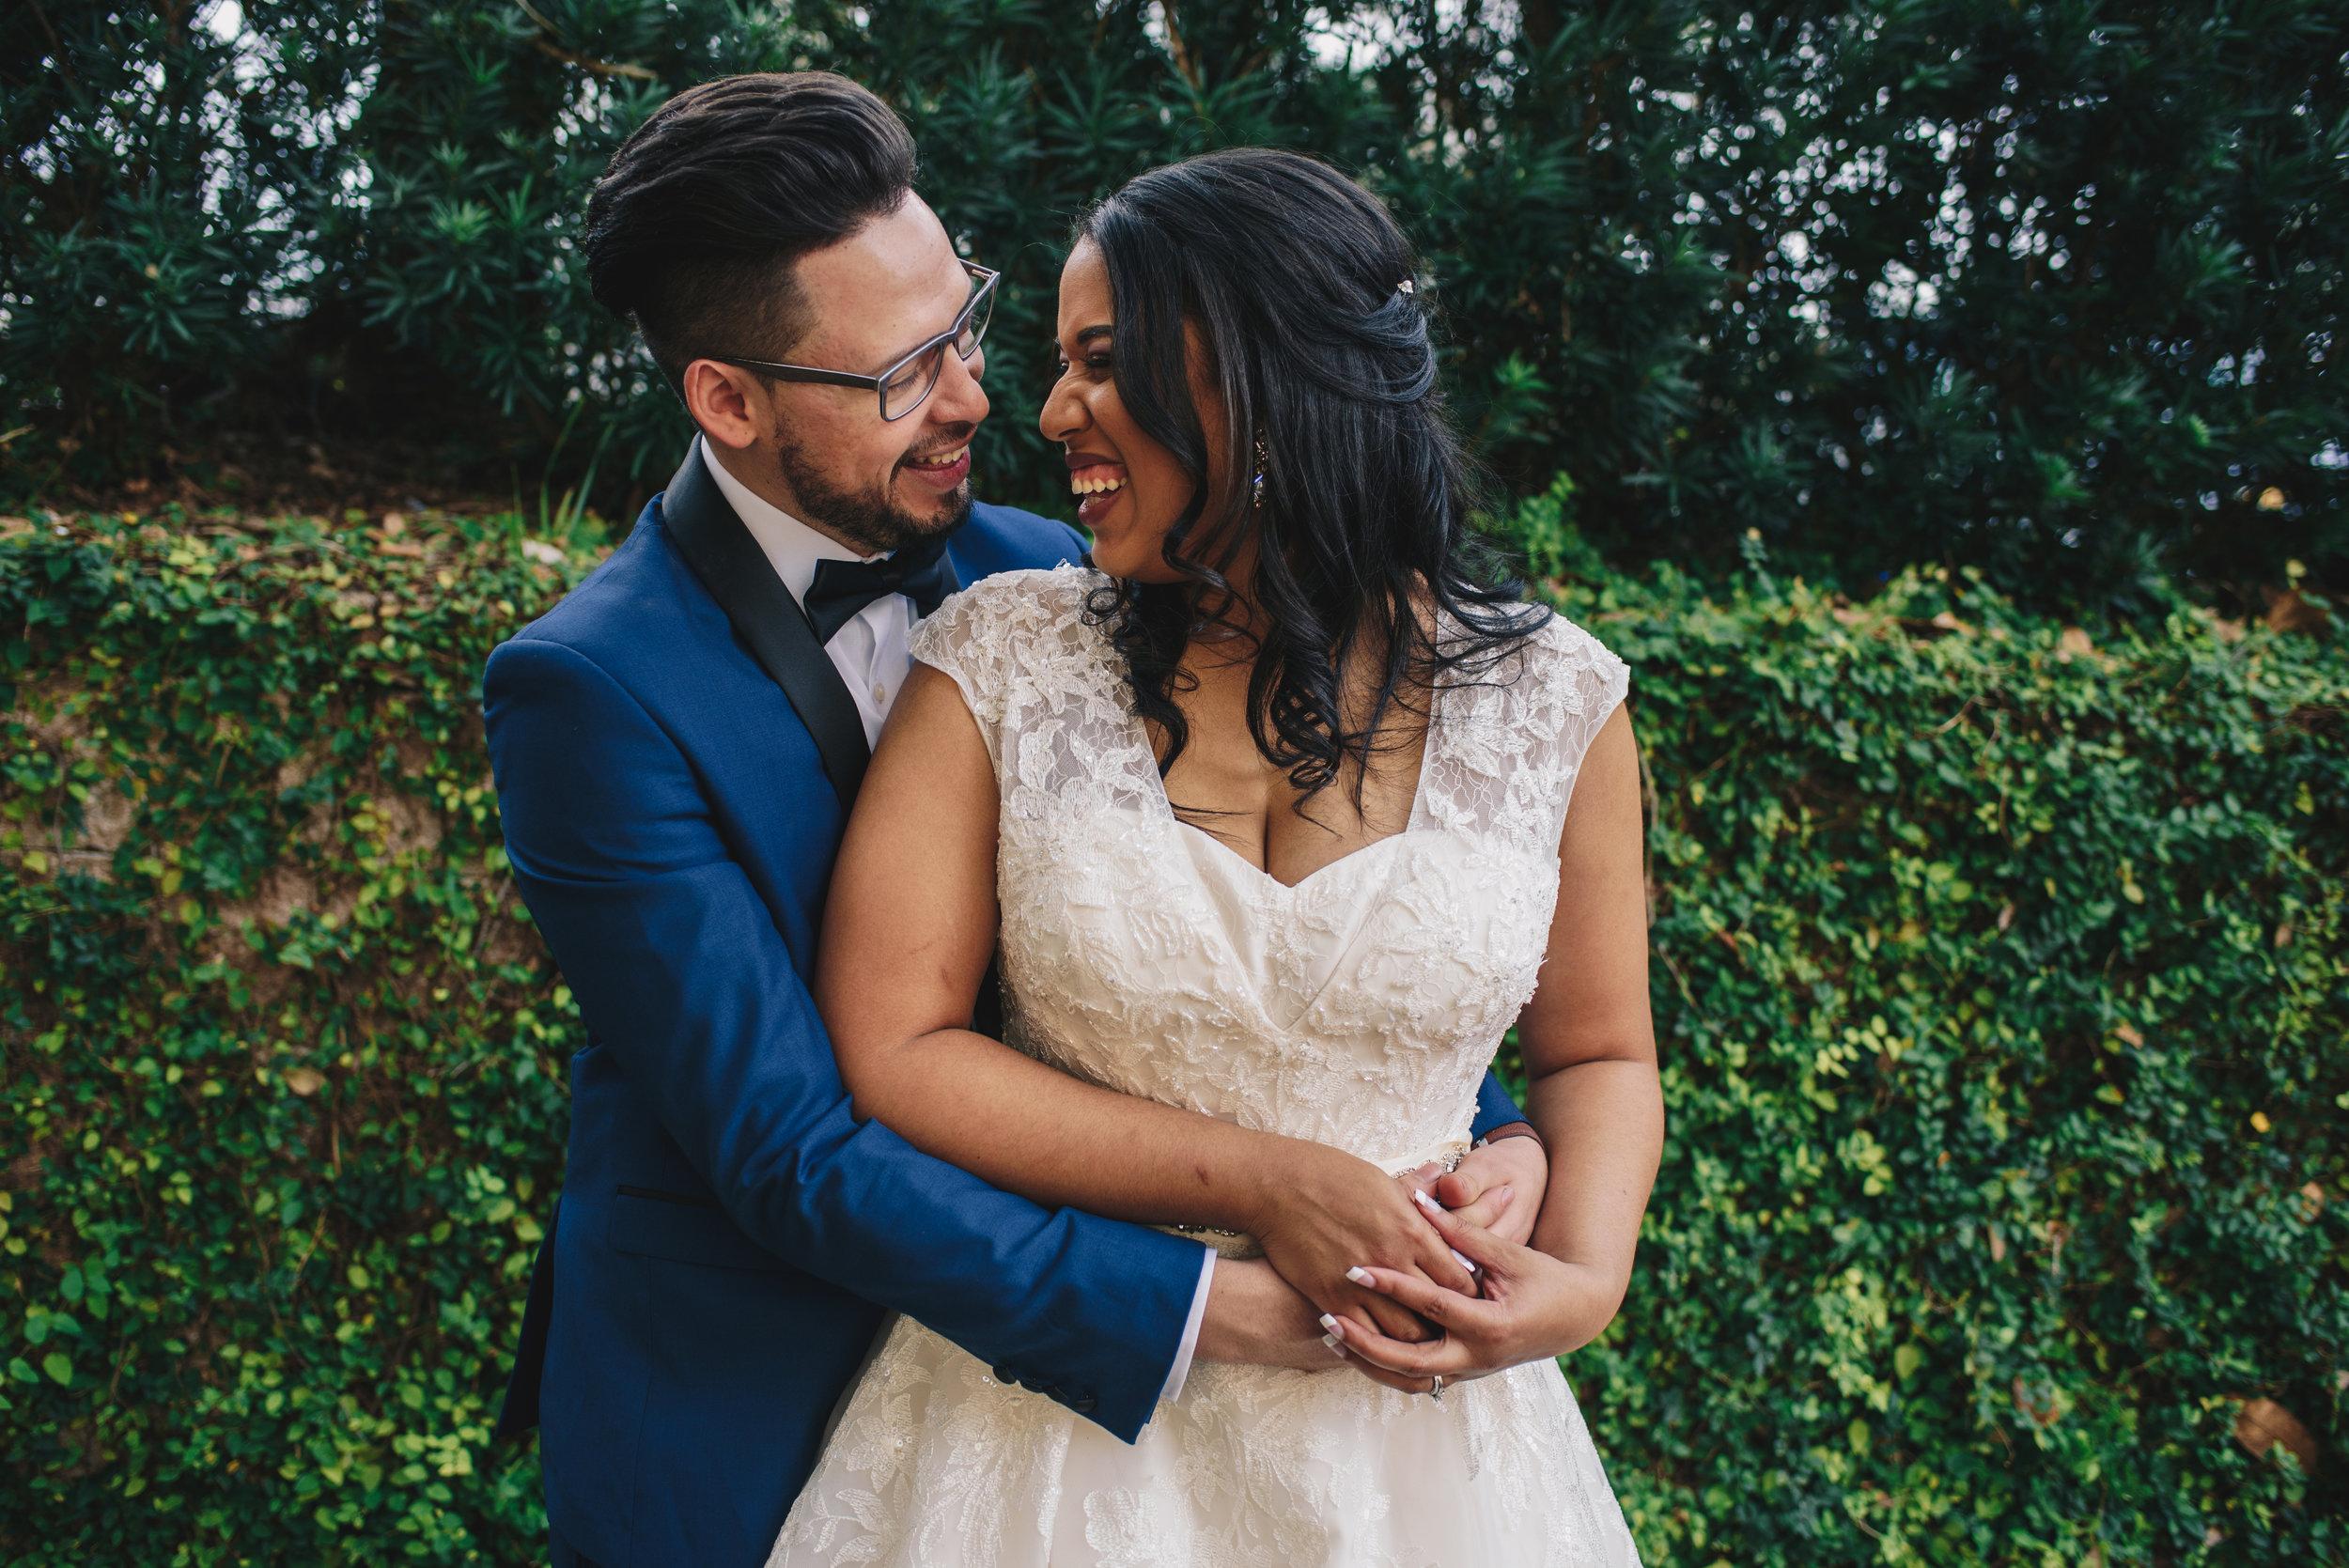 Abdy + Yvette | Wedding Day